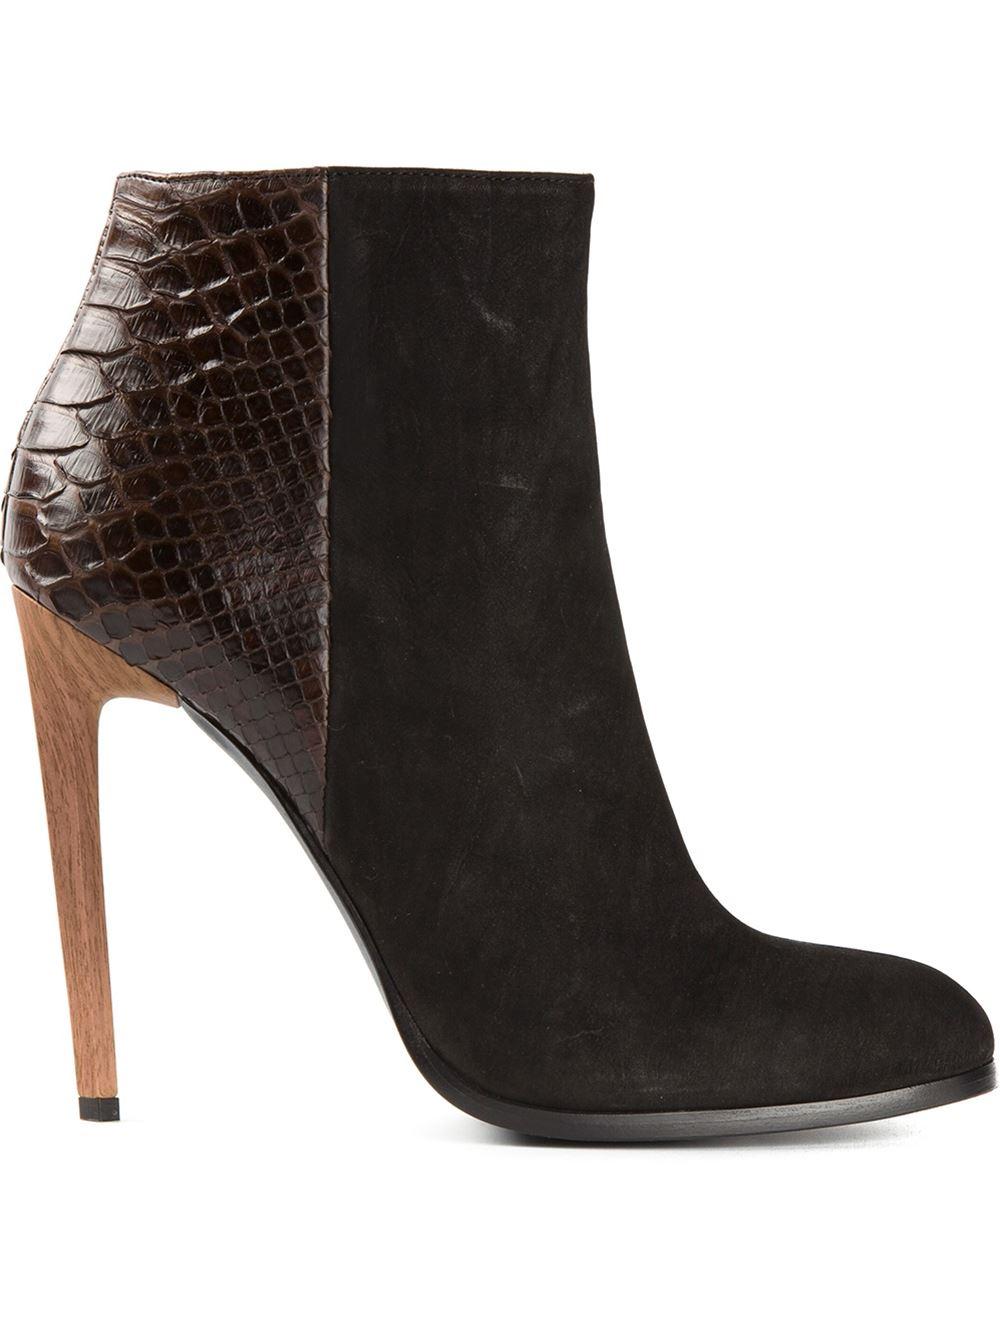 Haider Ackermann Stiletto heel ankle boots zEL1VG1